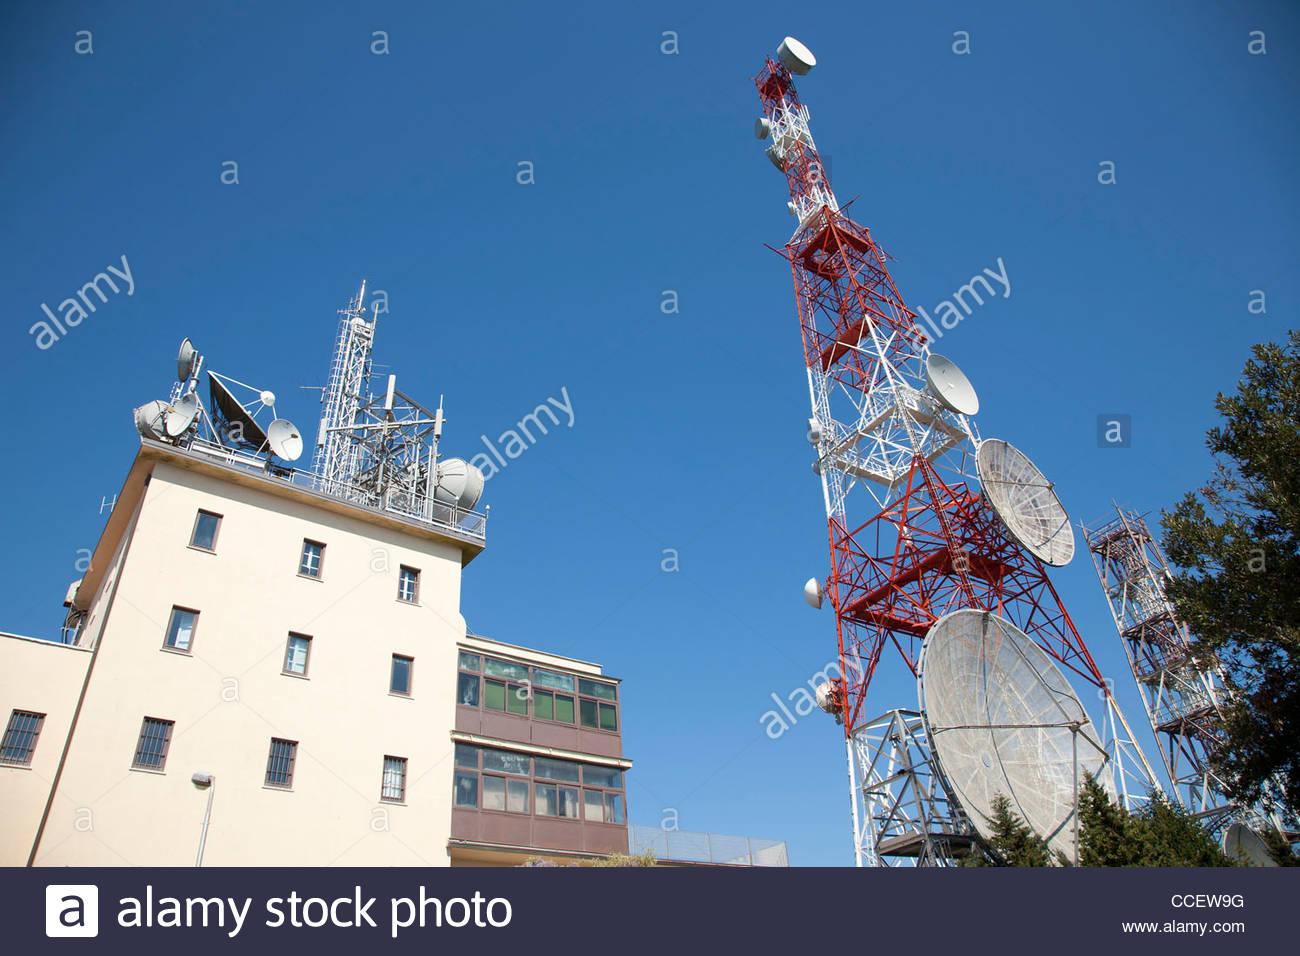 satellite aerials,argentario peninsula,tuscany,italy,europe - Stock Image